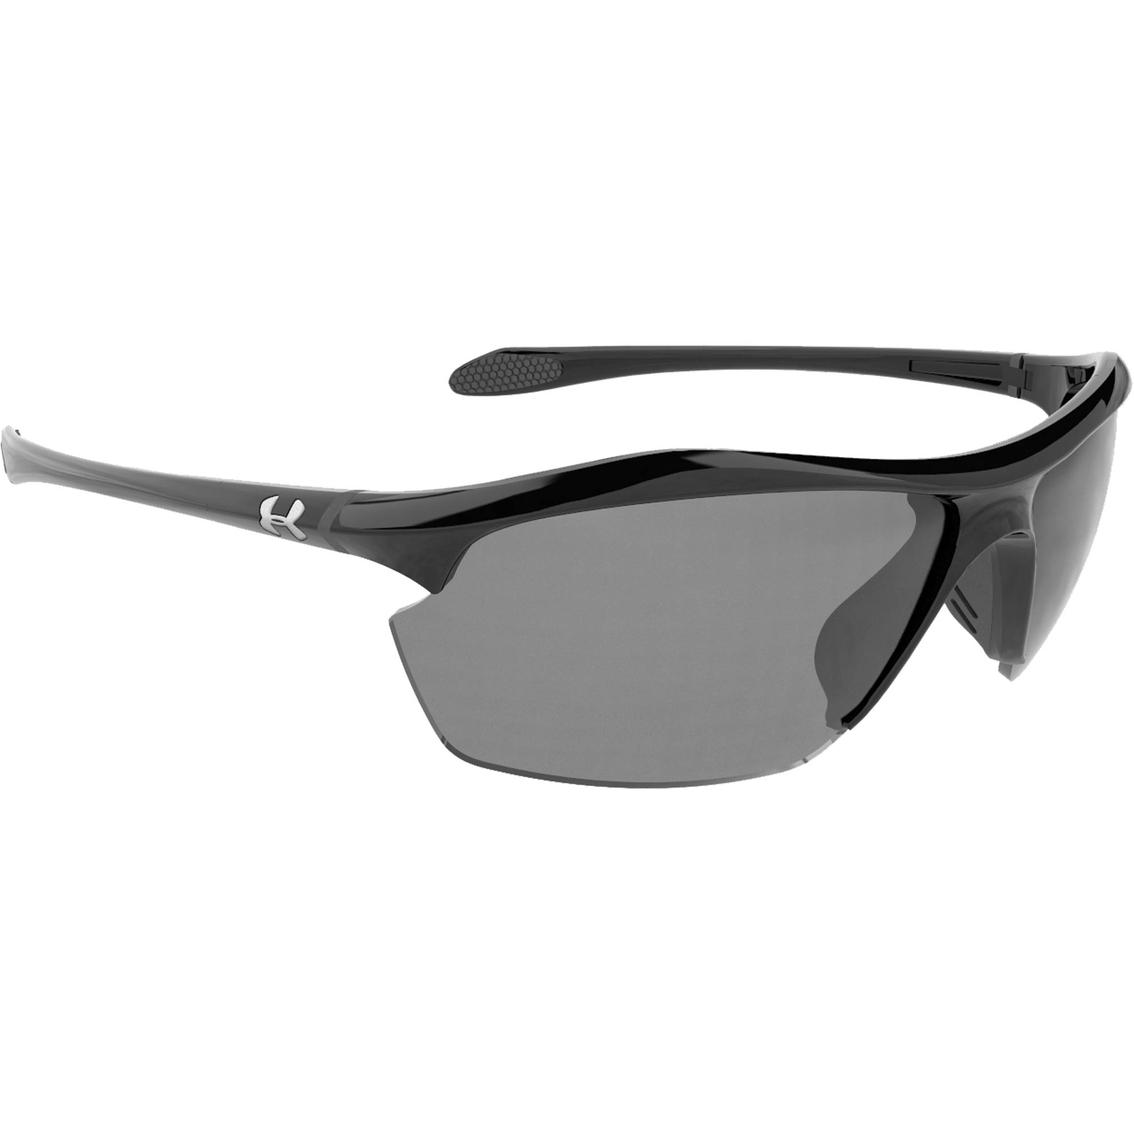 bc1d757d25 Under Armour Zone Xl Polarized Multiflection Lens Sunglasses ...